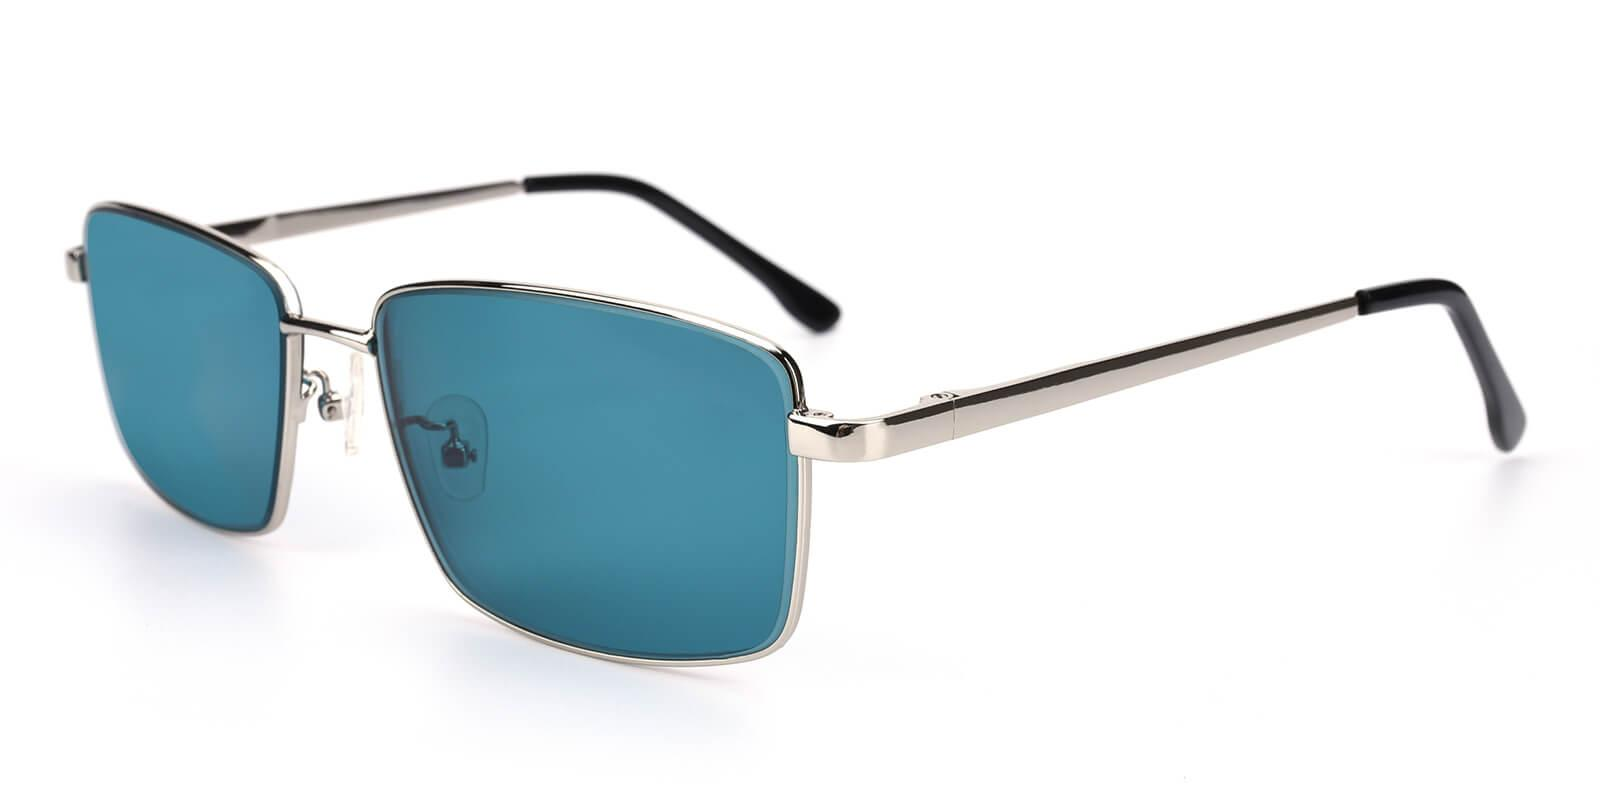 Sea-Silver-Rectangle-Metal-Sunglasses-additional1